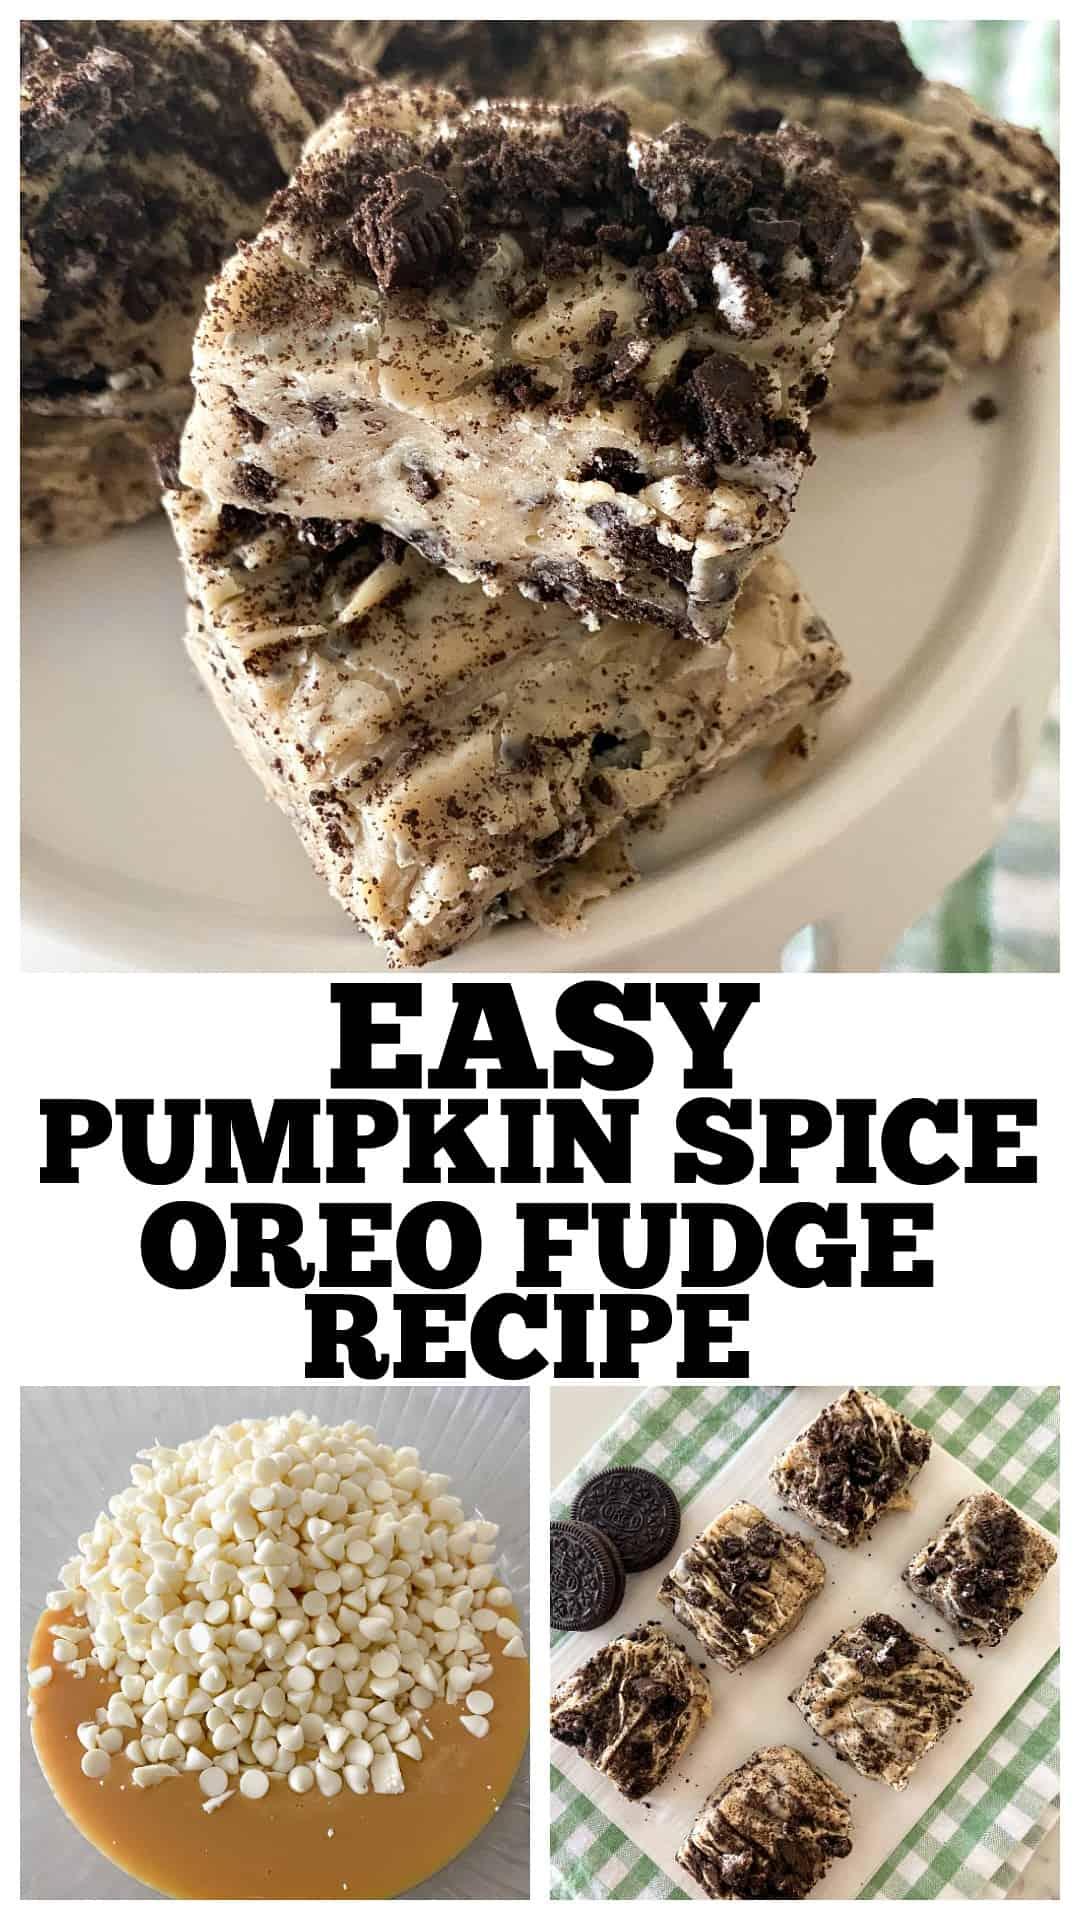 easy fudge recipe photo collage